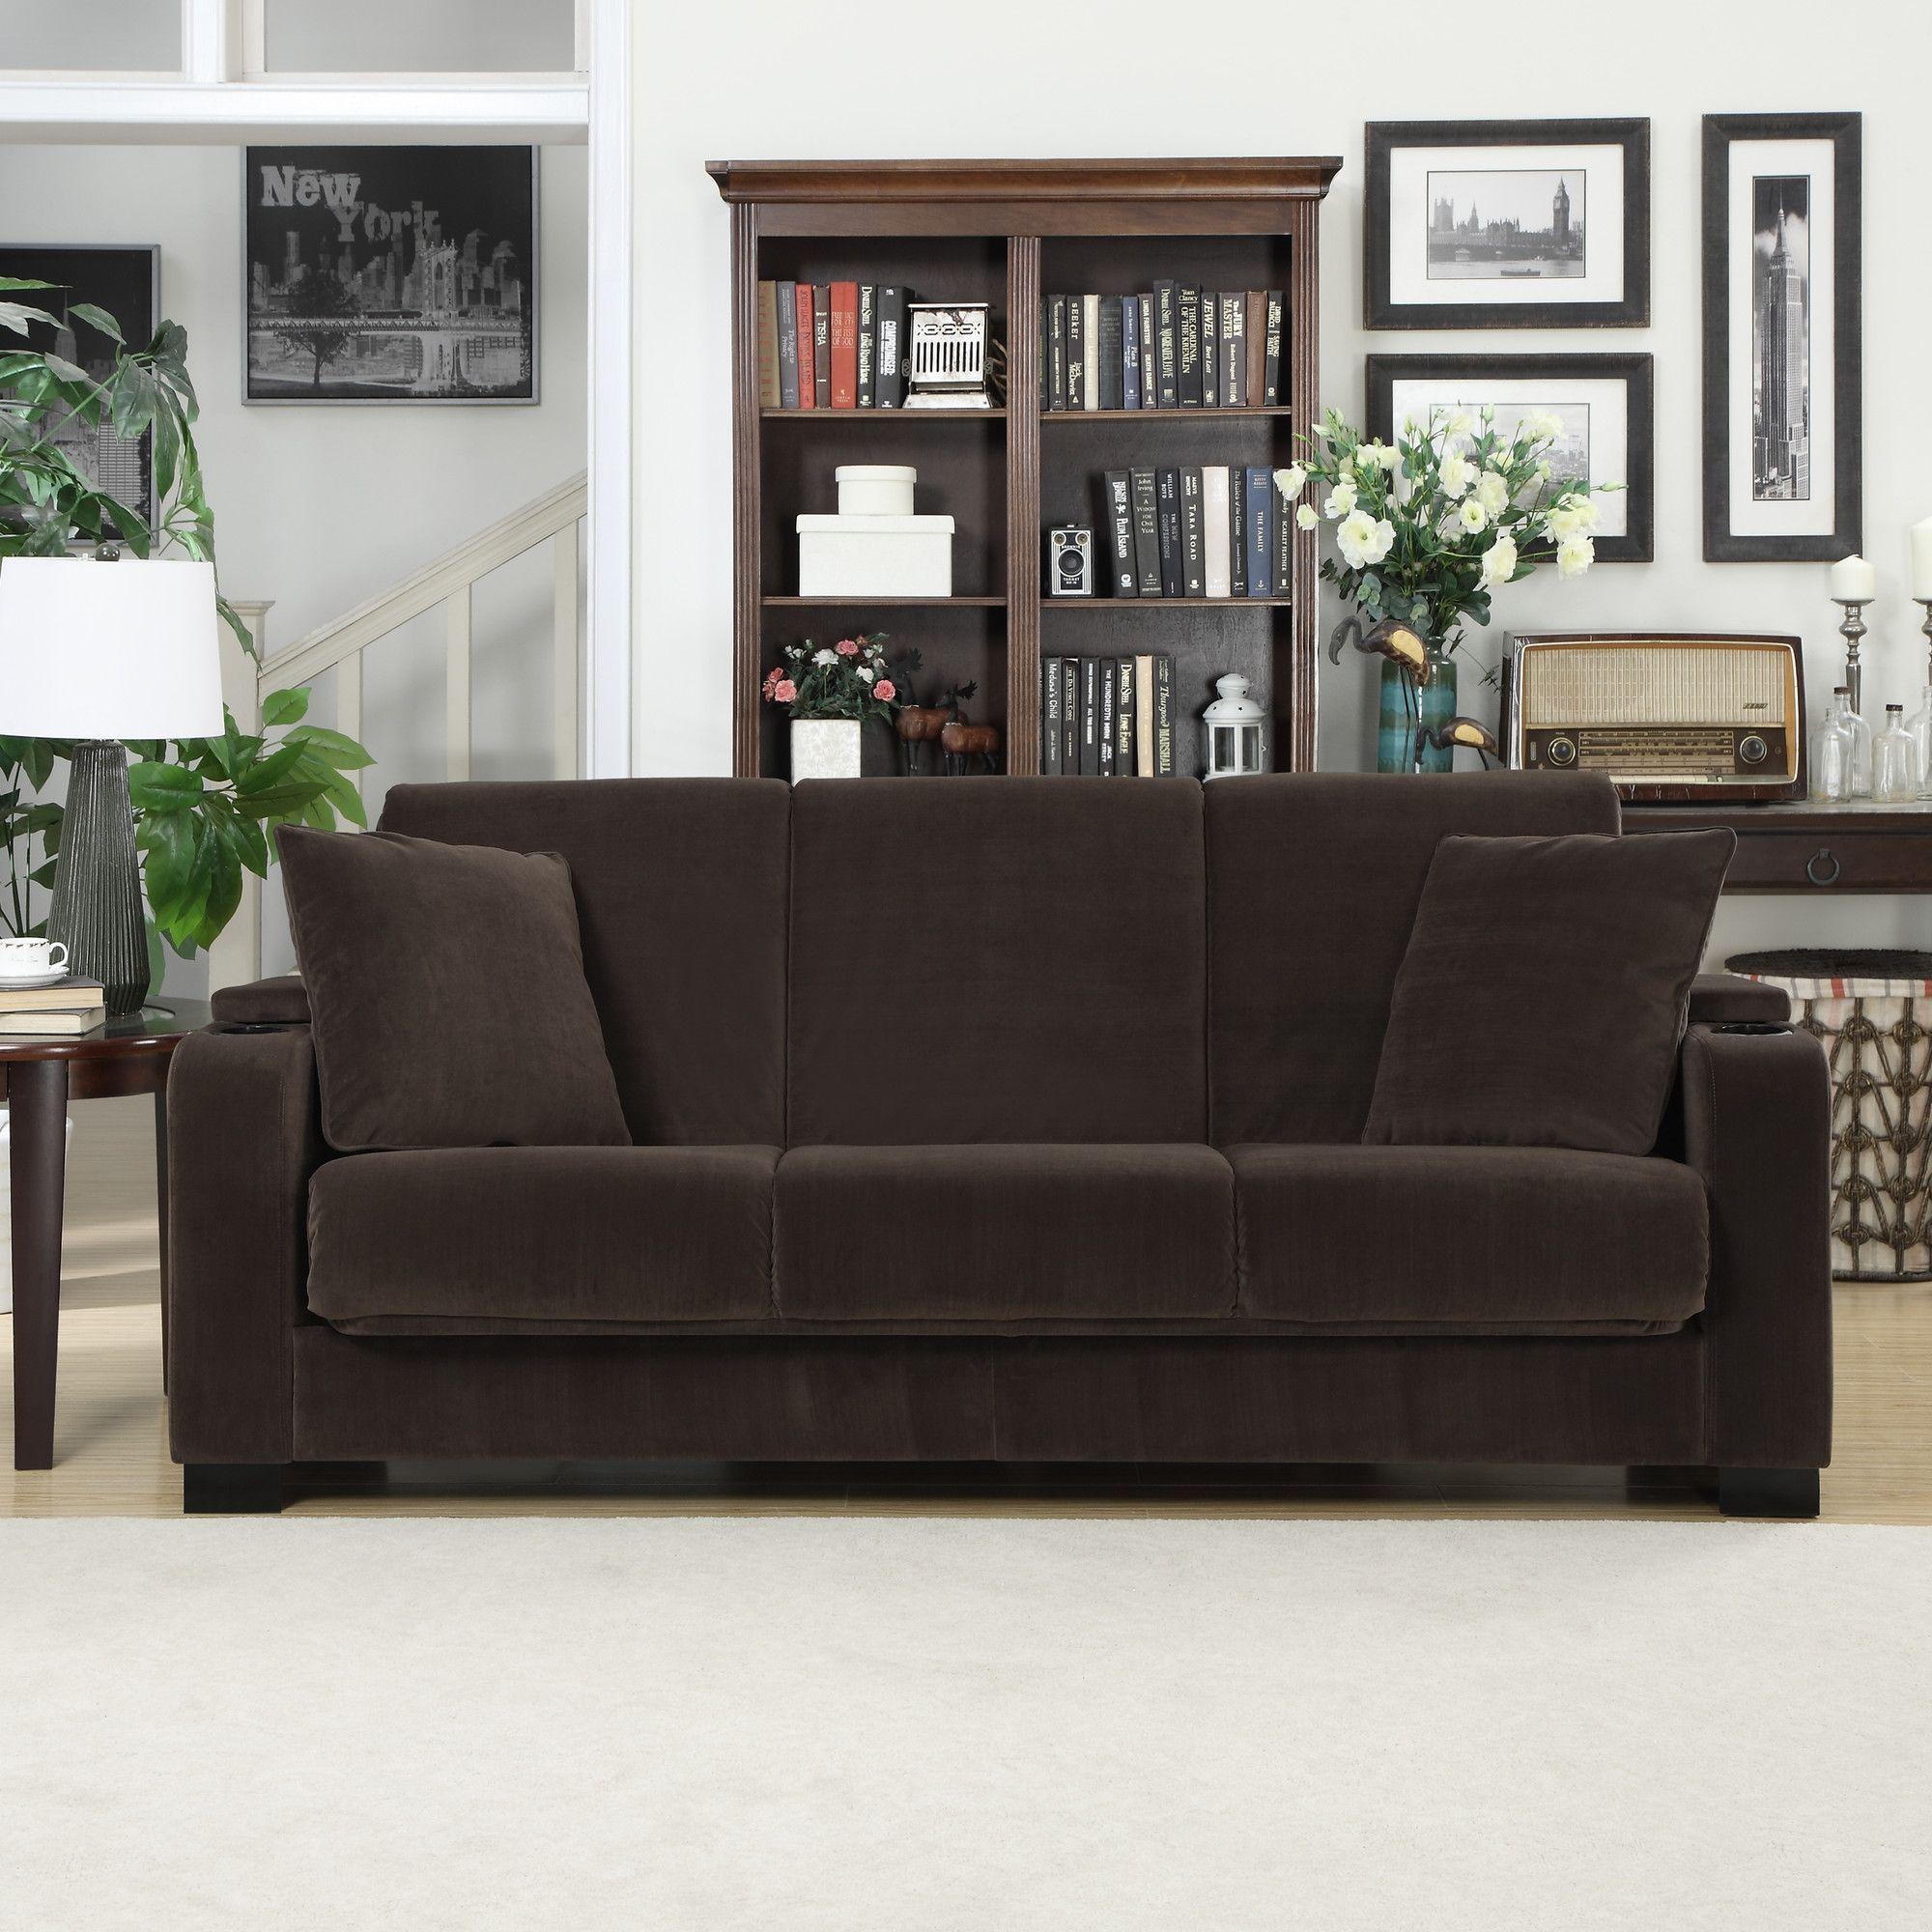 Olivia Convert A Couch Sleeper Sofa Sleeper Sofa Sofa Cheap Couch